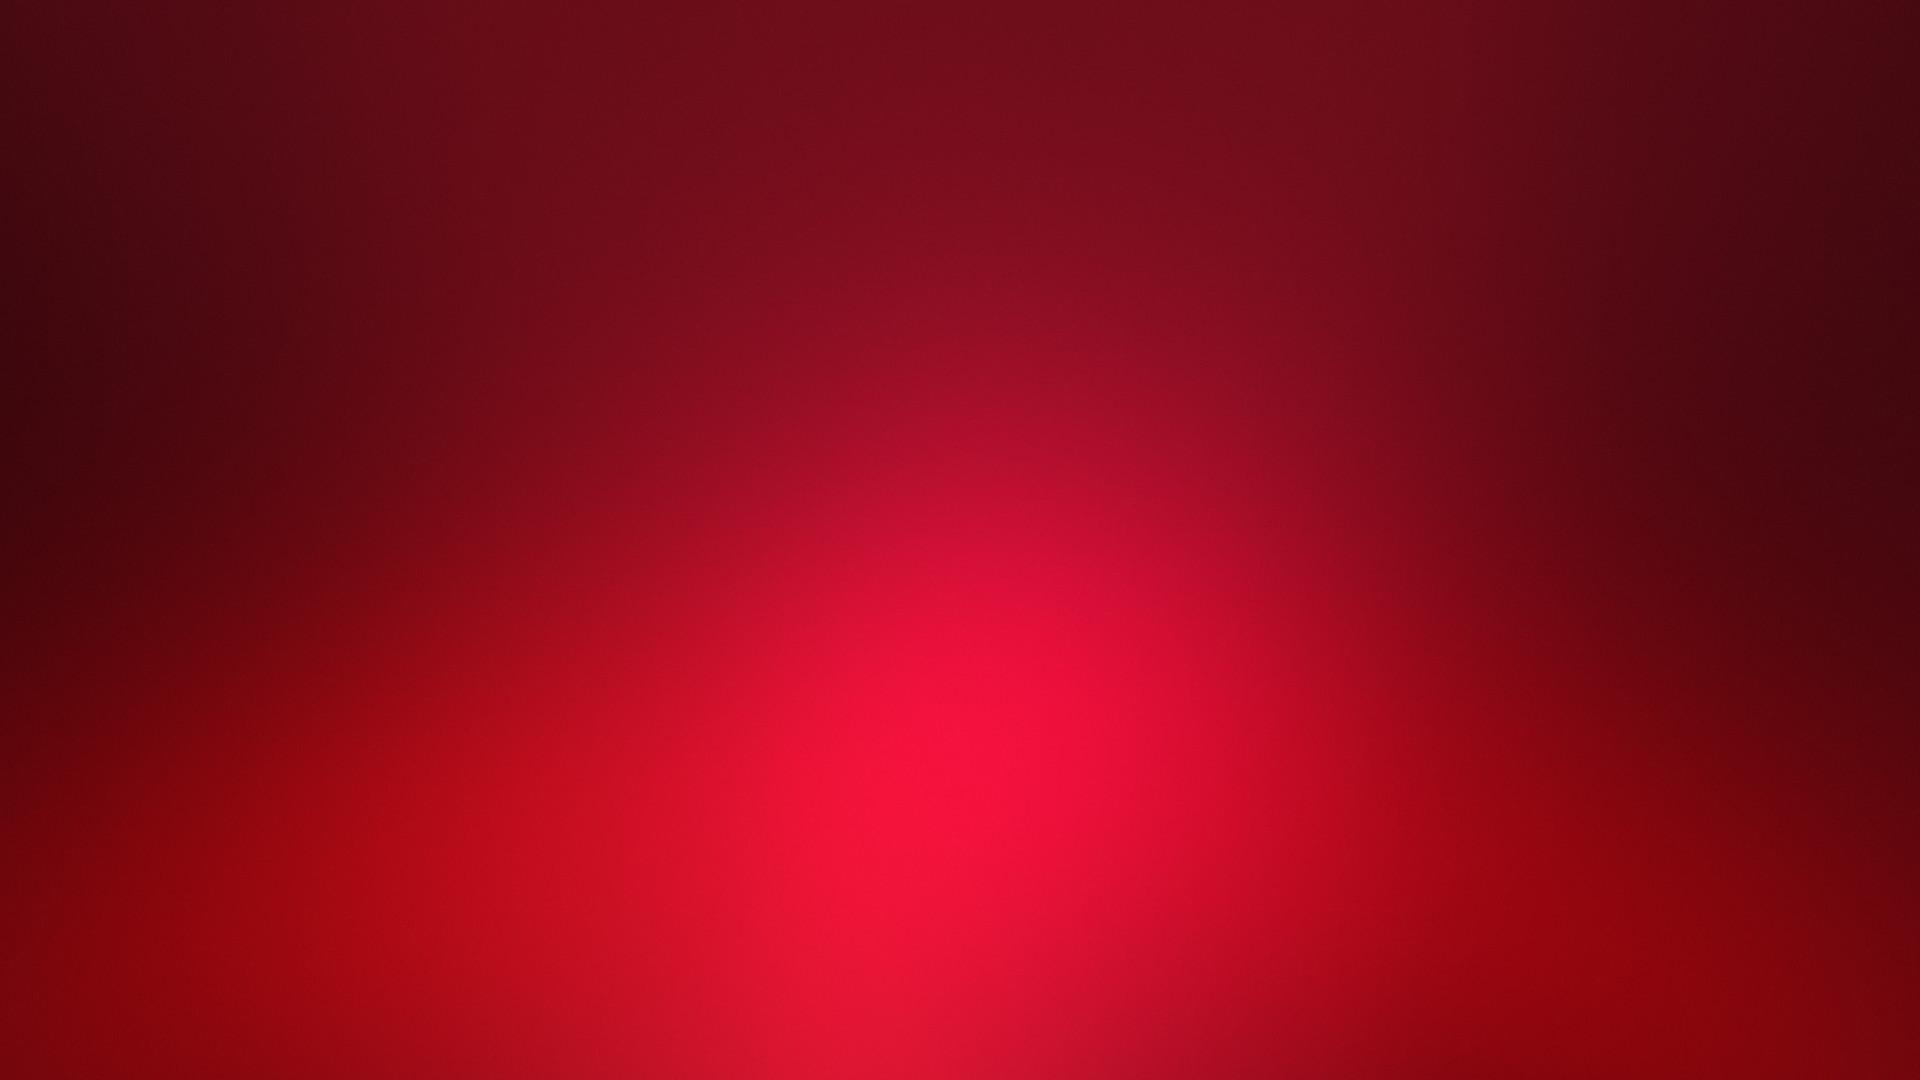 Red faded light HD Wallpaper 1920×1080